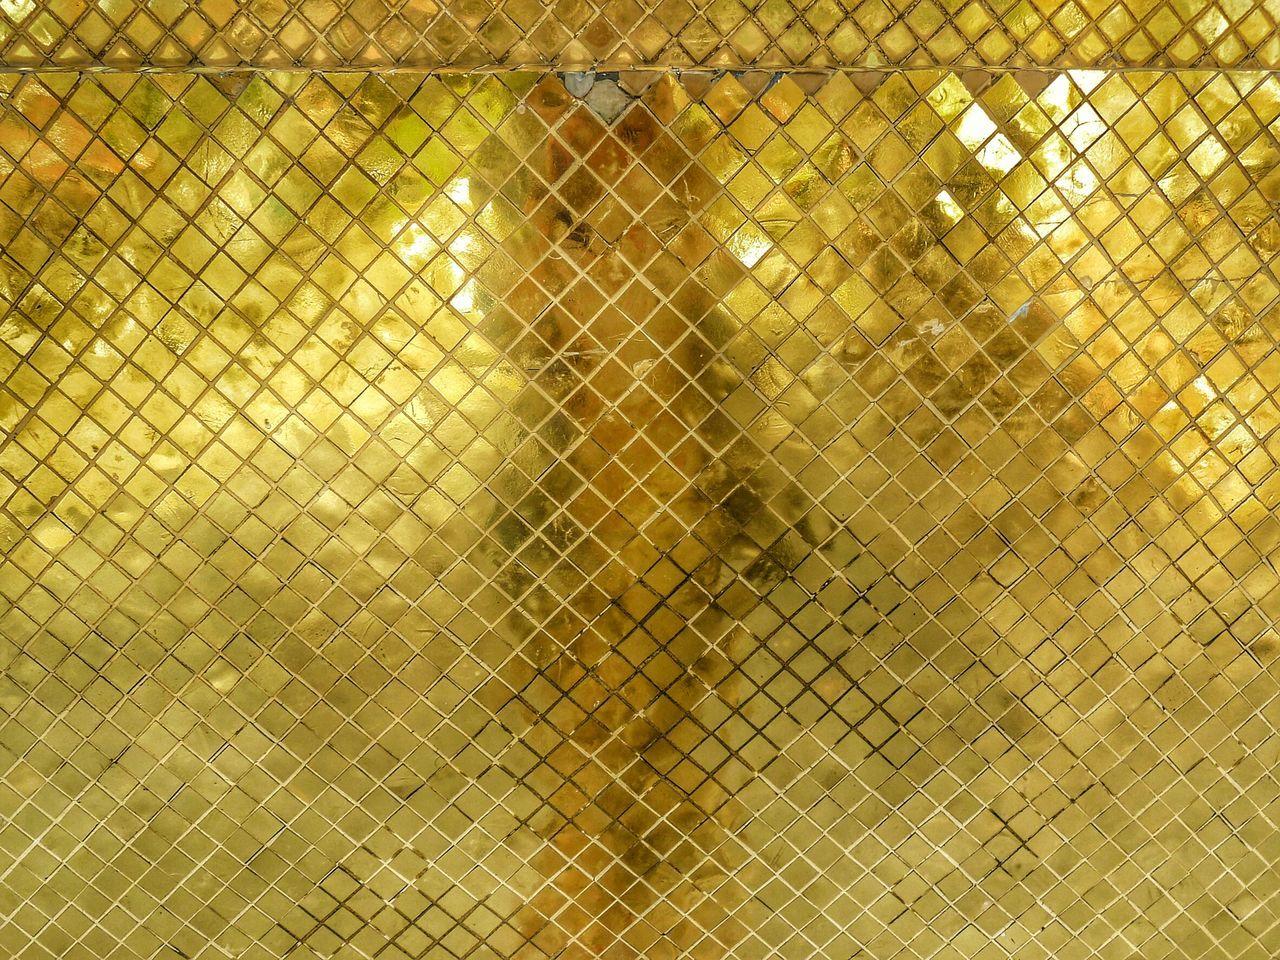 Detail Shot Of Fence